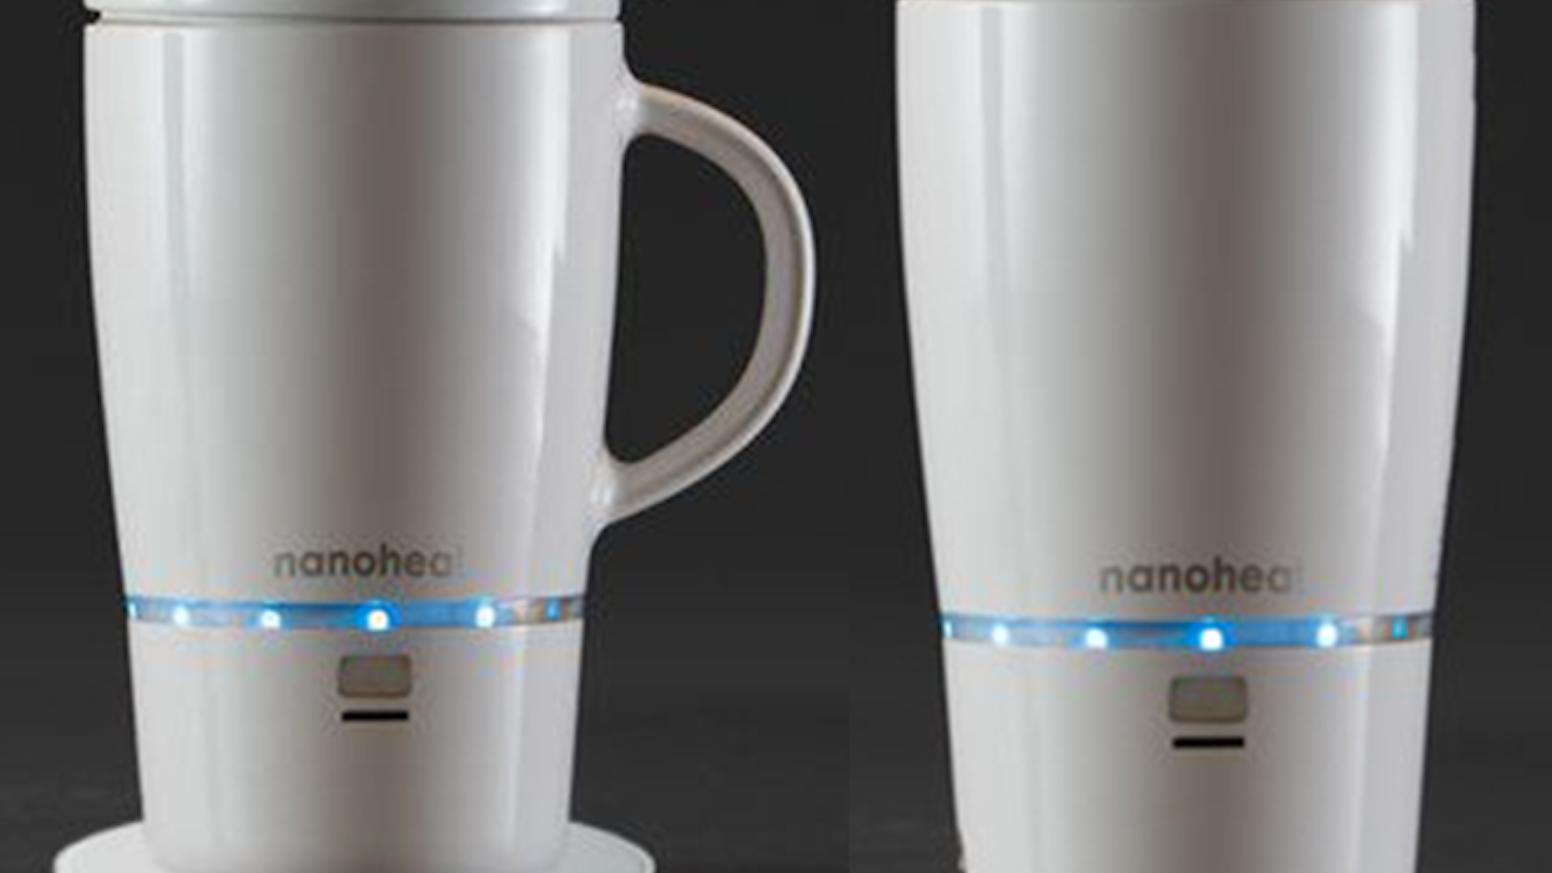 Nano Heated Wireless Mug Cup By Design Hmi Llc And Green